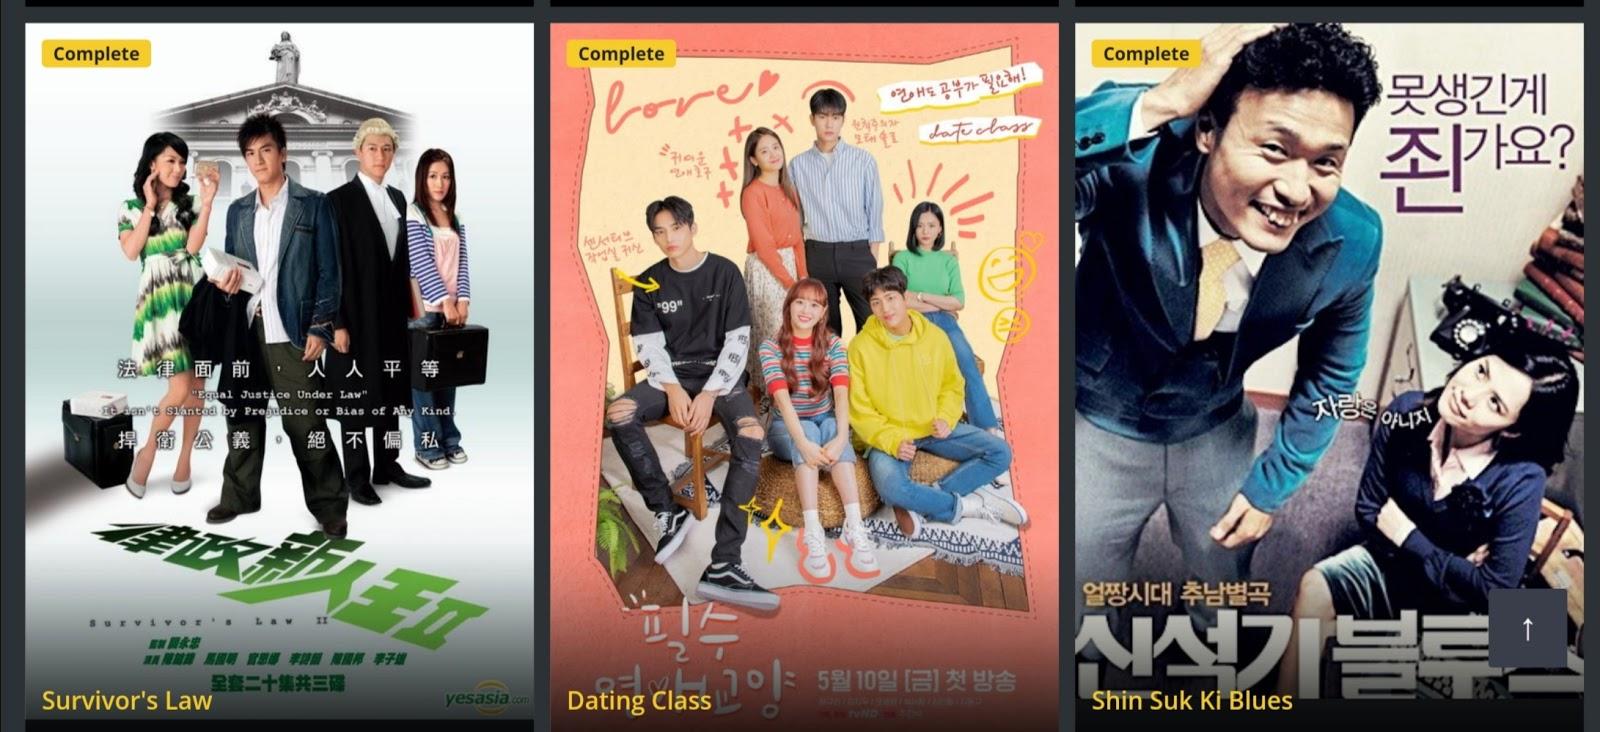 Asianrun Korean movie website